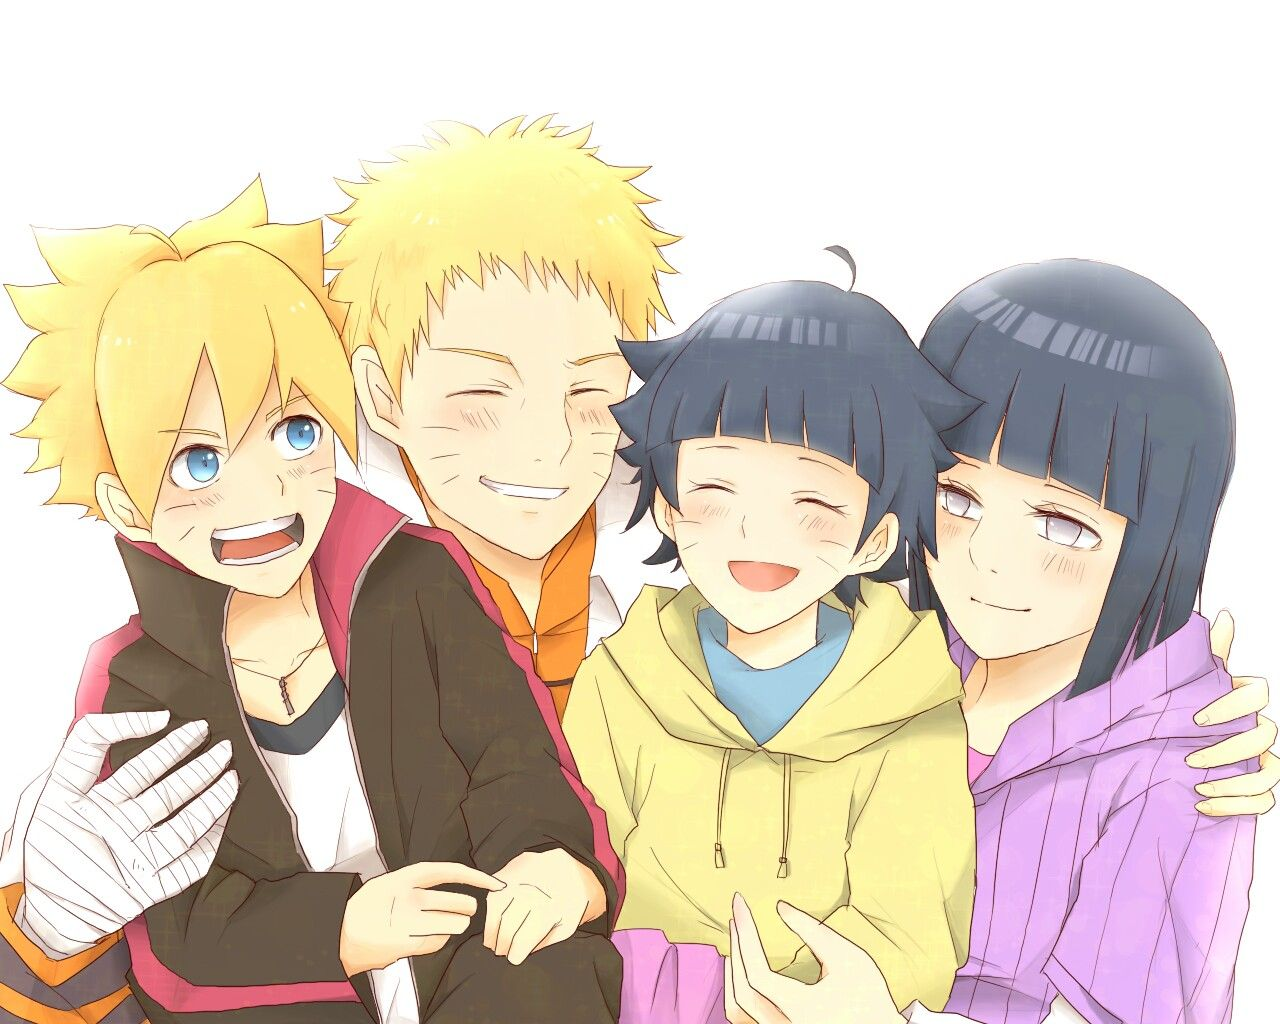 Naruto Quotes About Friendship Pinrocio Castro On Naruto  Pinterest  Boruto Naruto And Anime